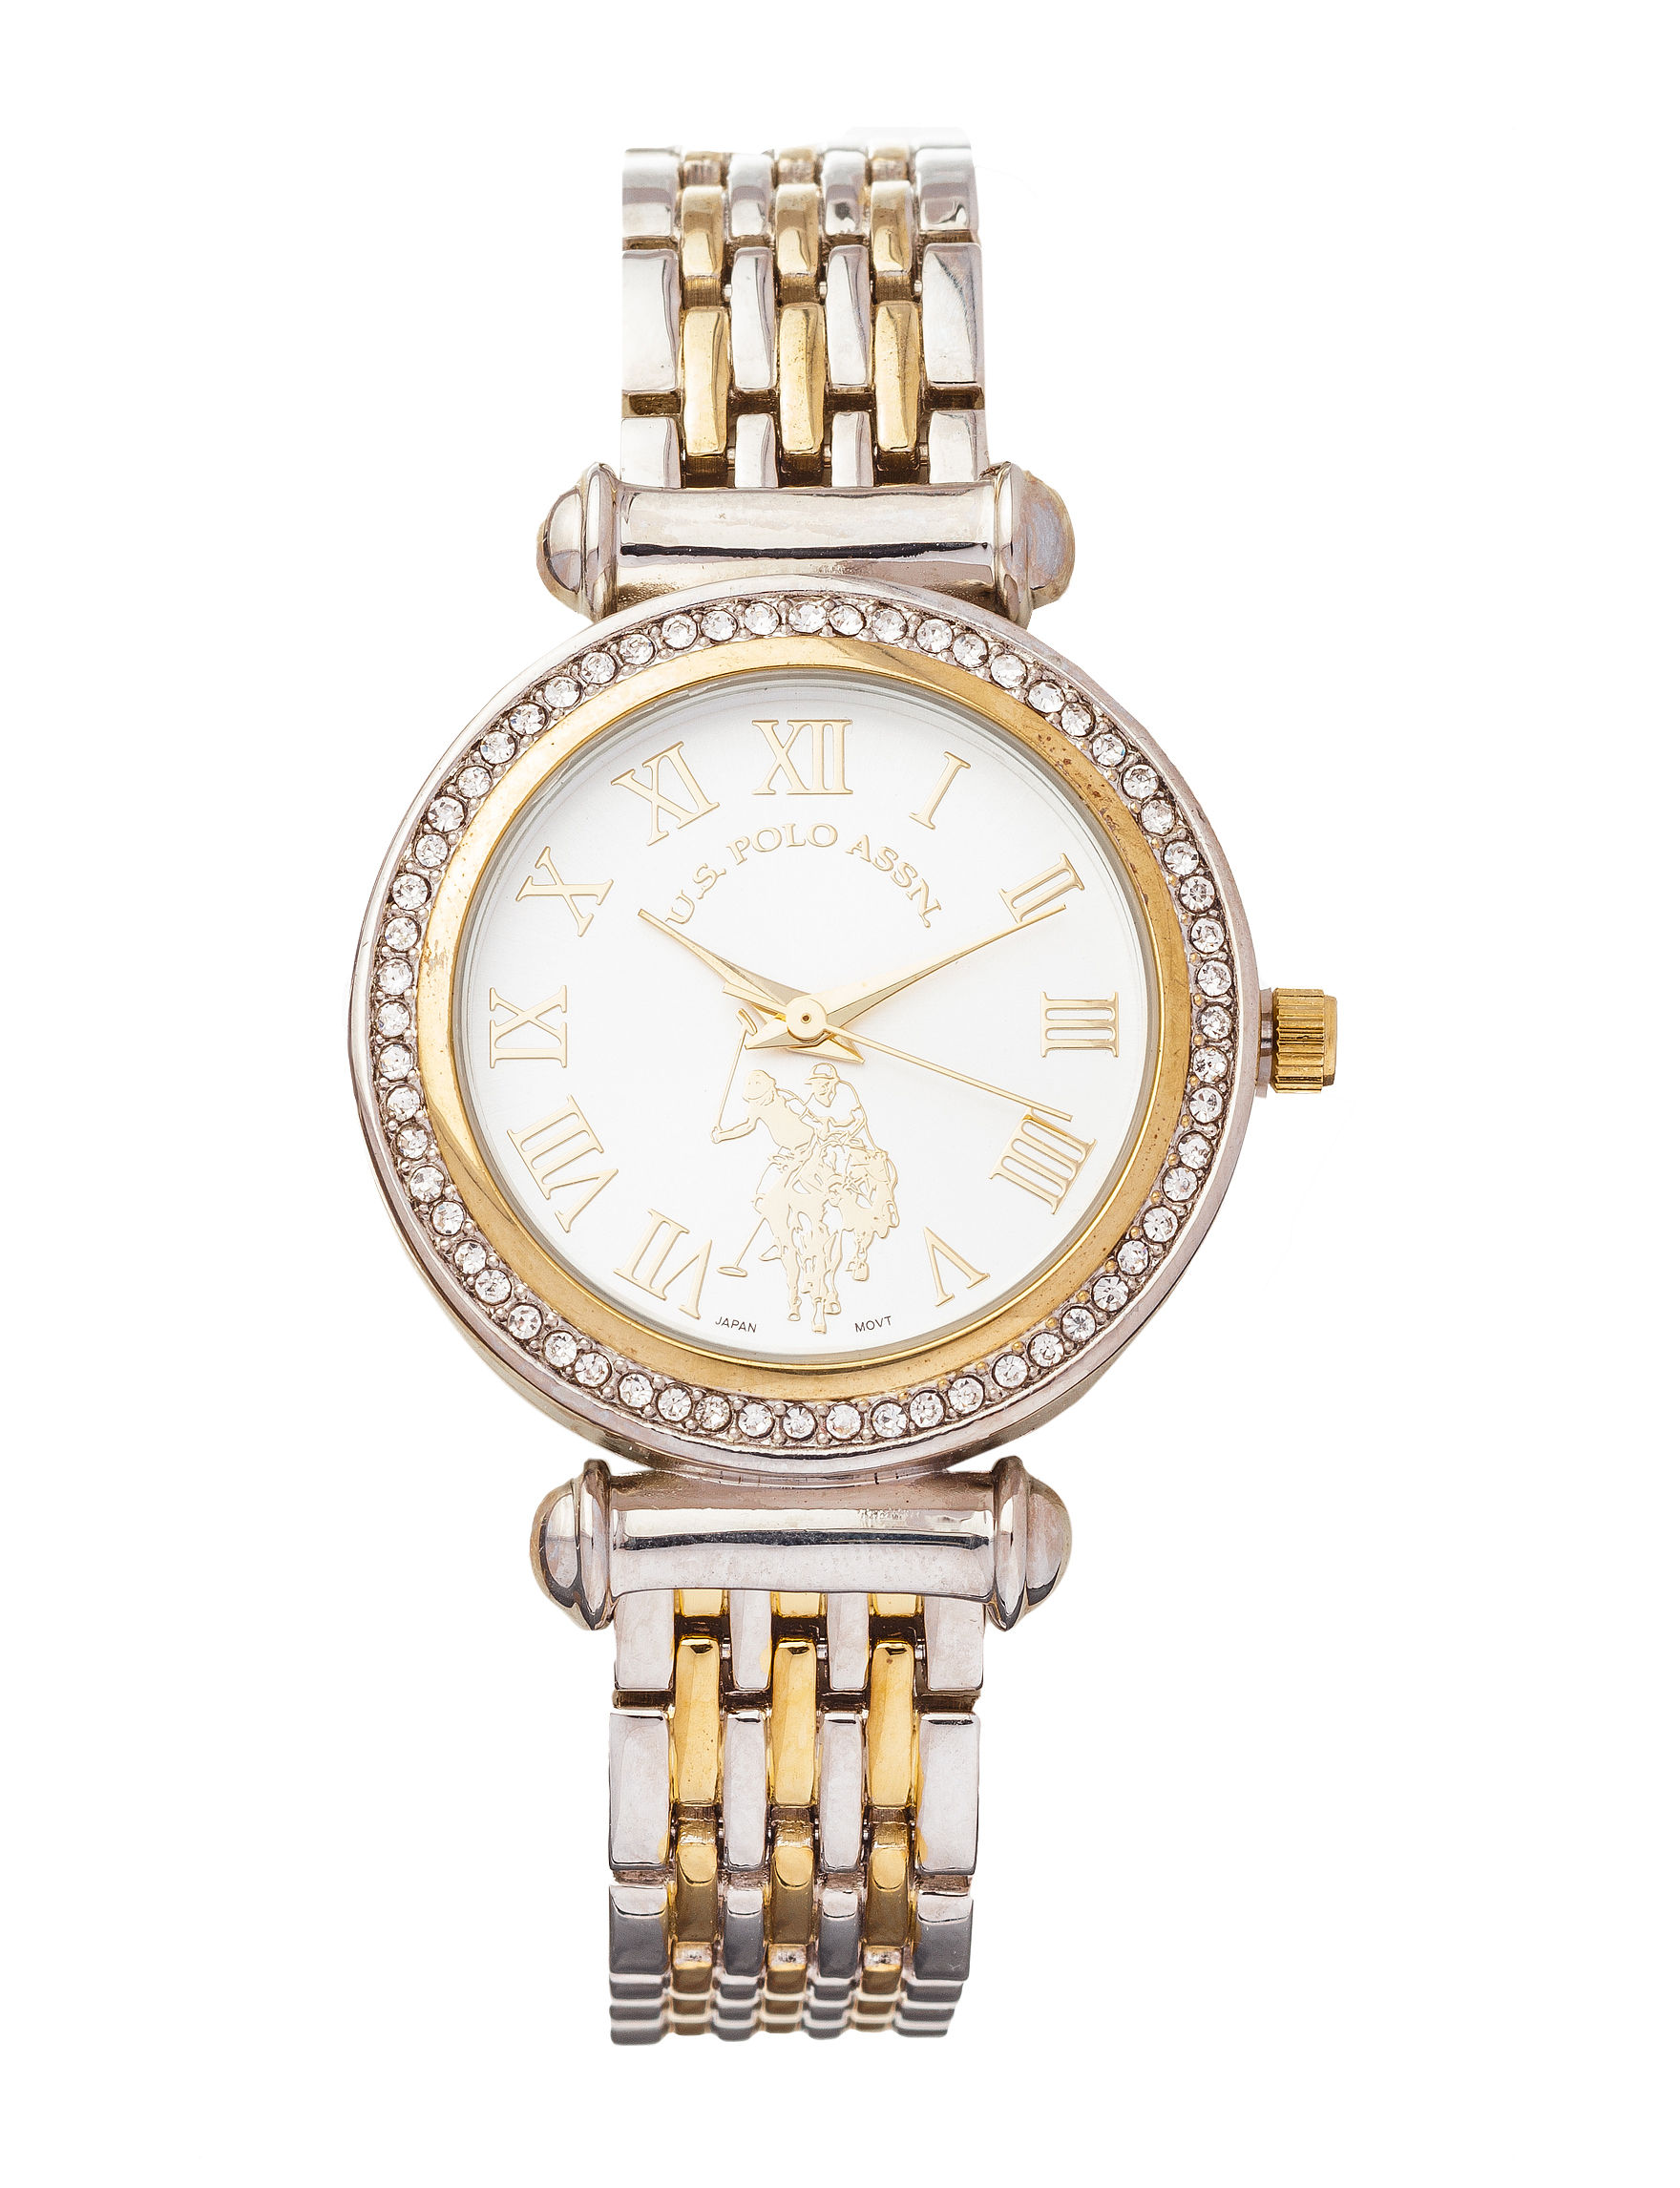 U.S. Polo Assn. Two Tone Fashion Watches